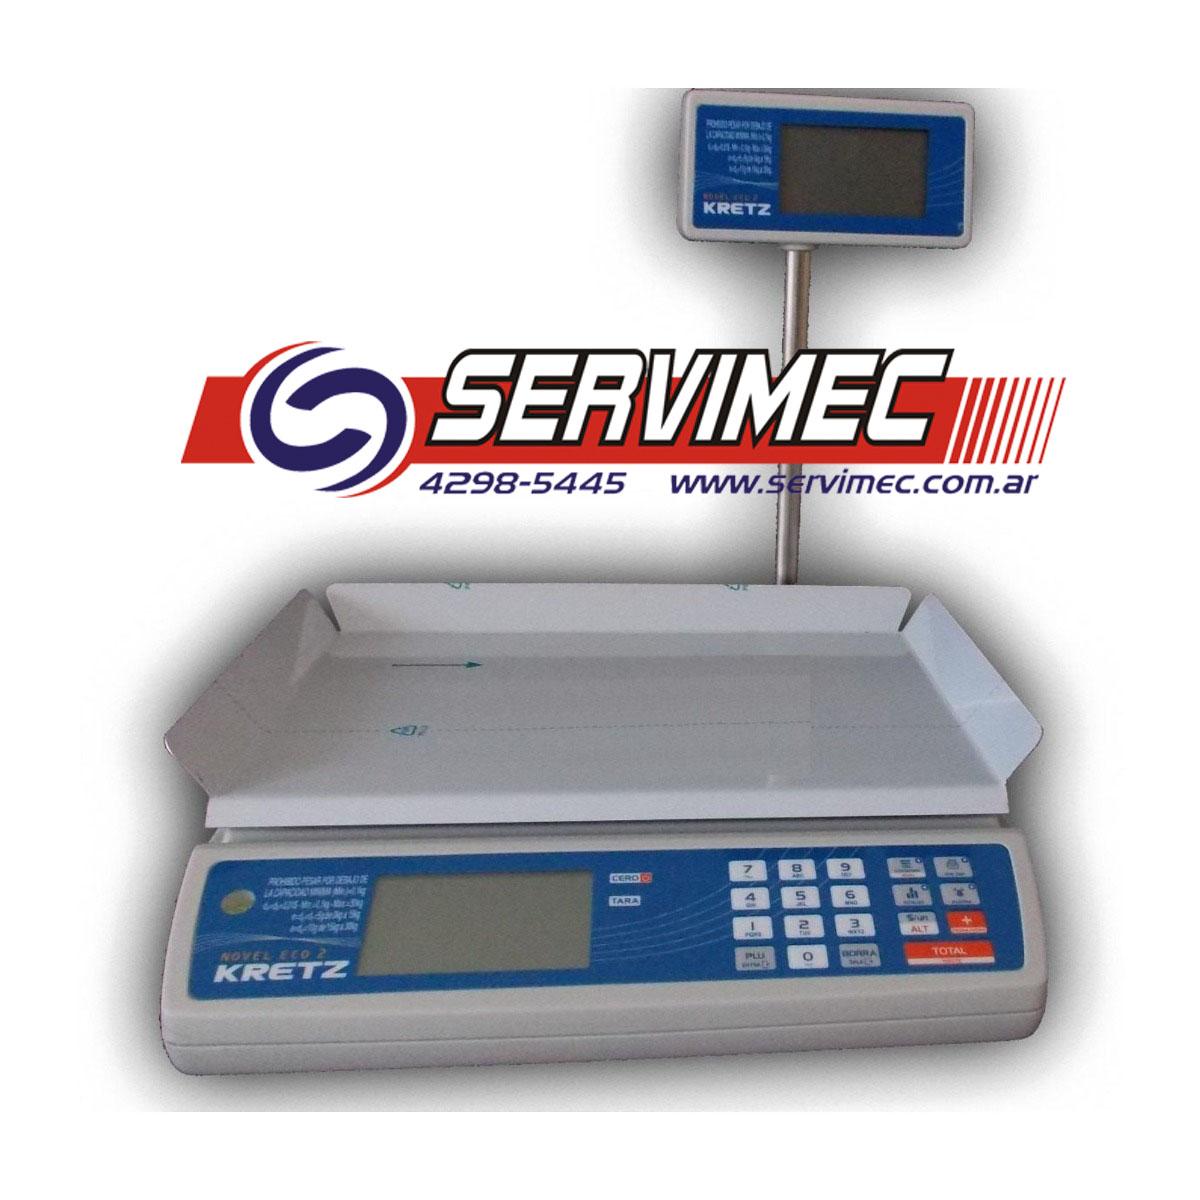 balanza-electronica-kretz-novel-2-30-kg-cbateria-friosur-22312-MLA20227906668_012015-F